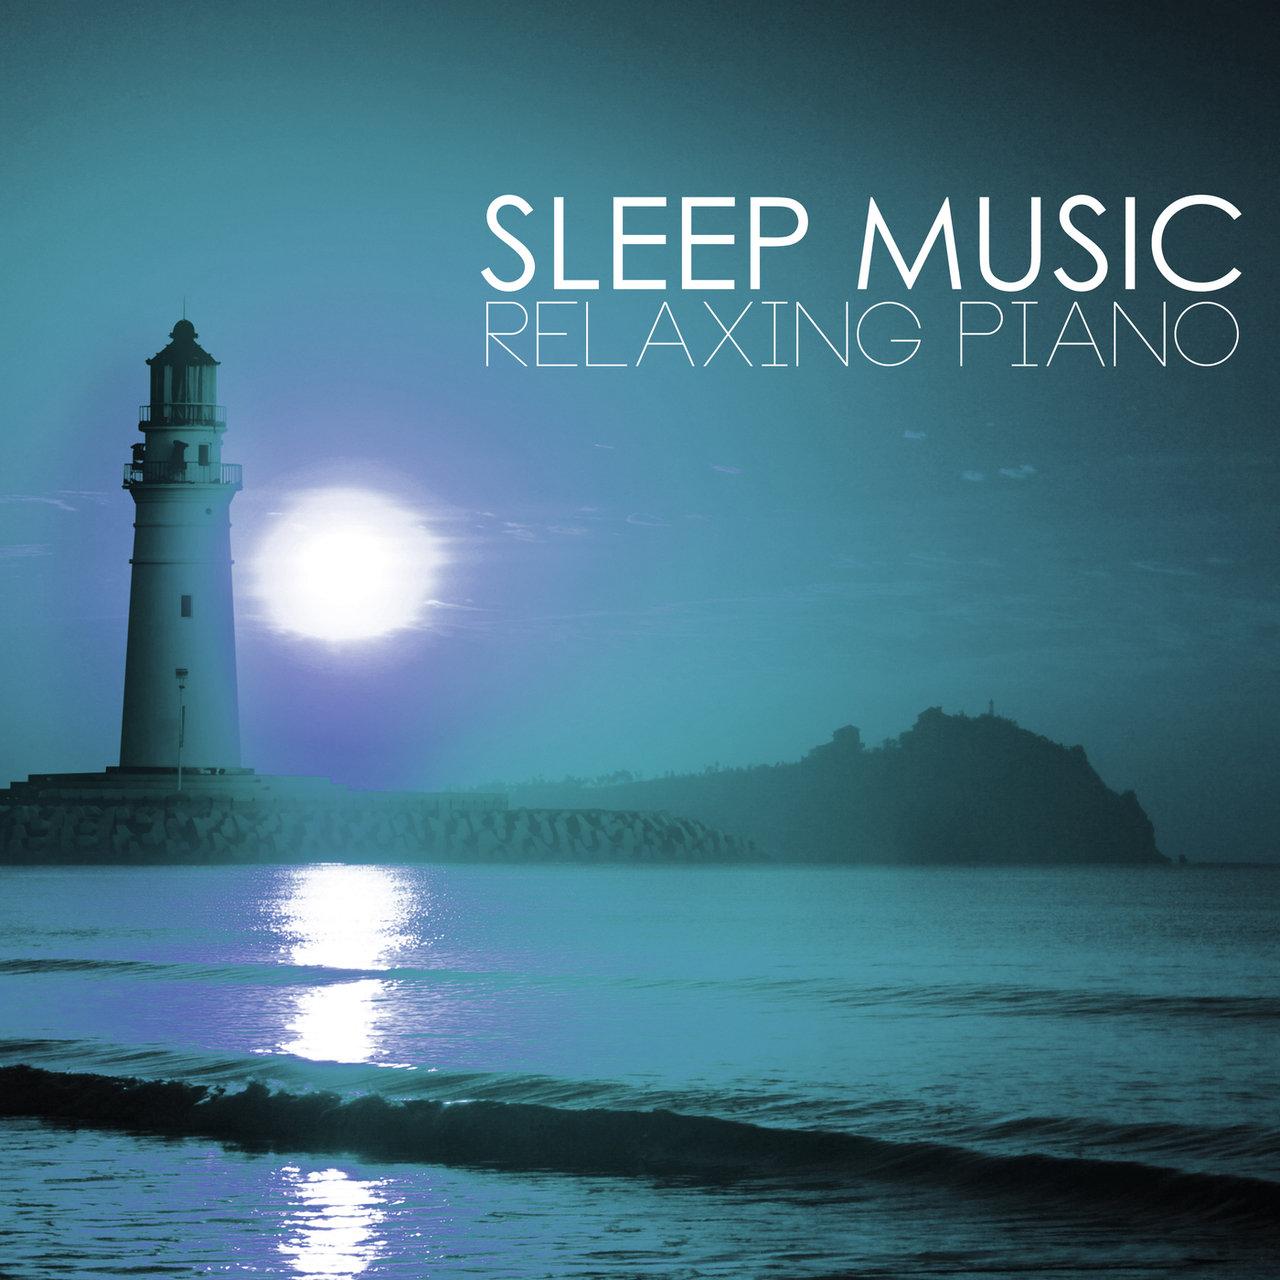 TIDAL: Listen to Sleep Music Lullabies on TIDAL